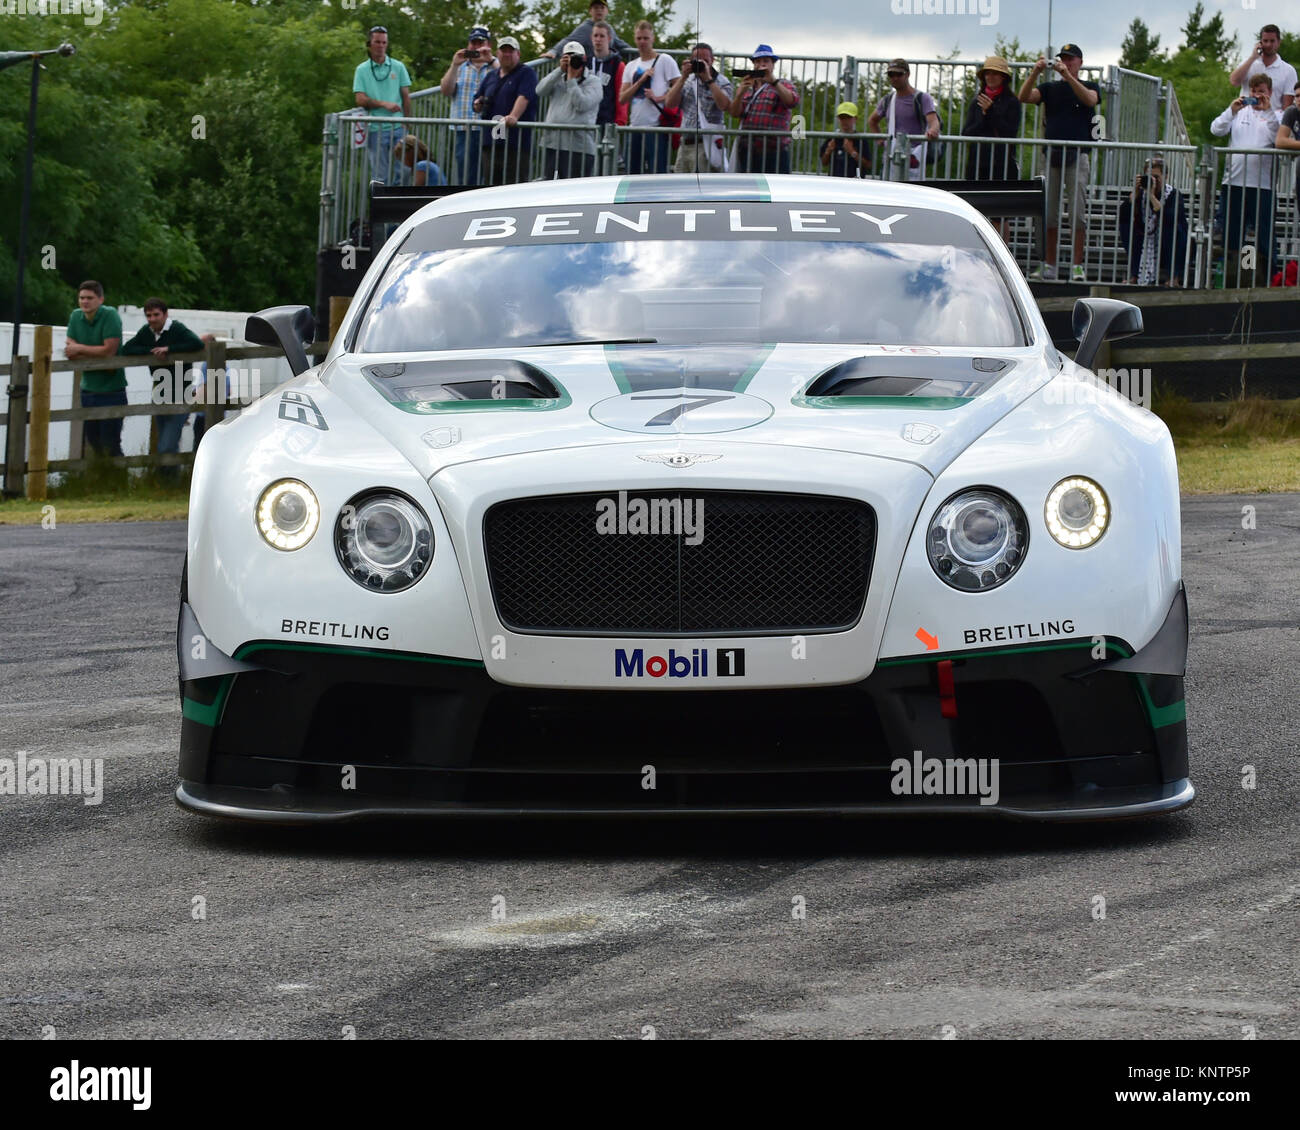 2013 Bentley Continental Gt Speed Convertible: Bentley Continental Speed Stock Photos & Bentley